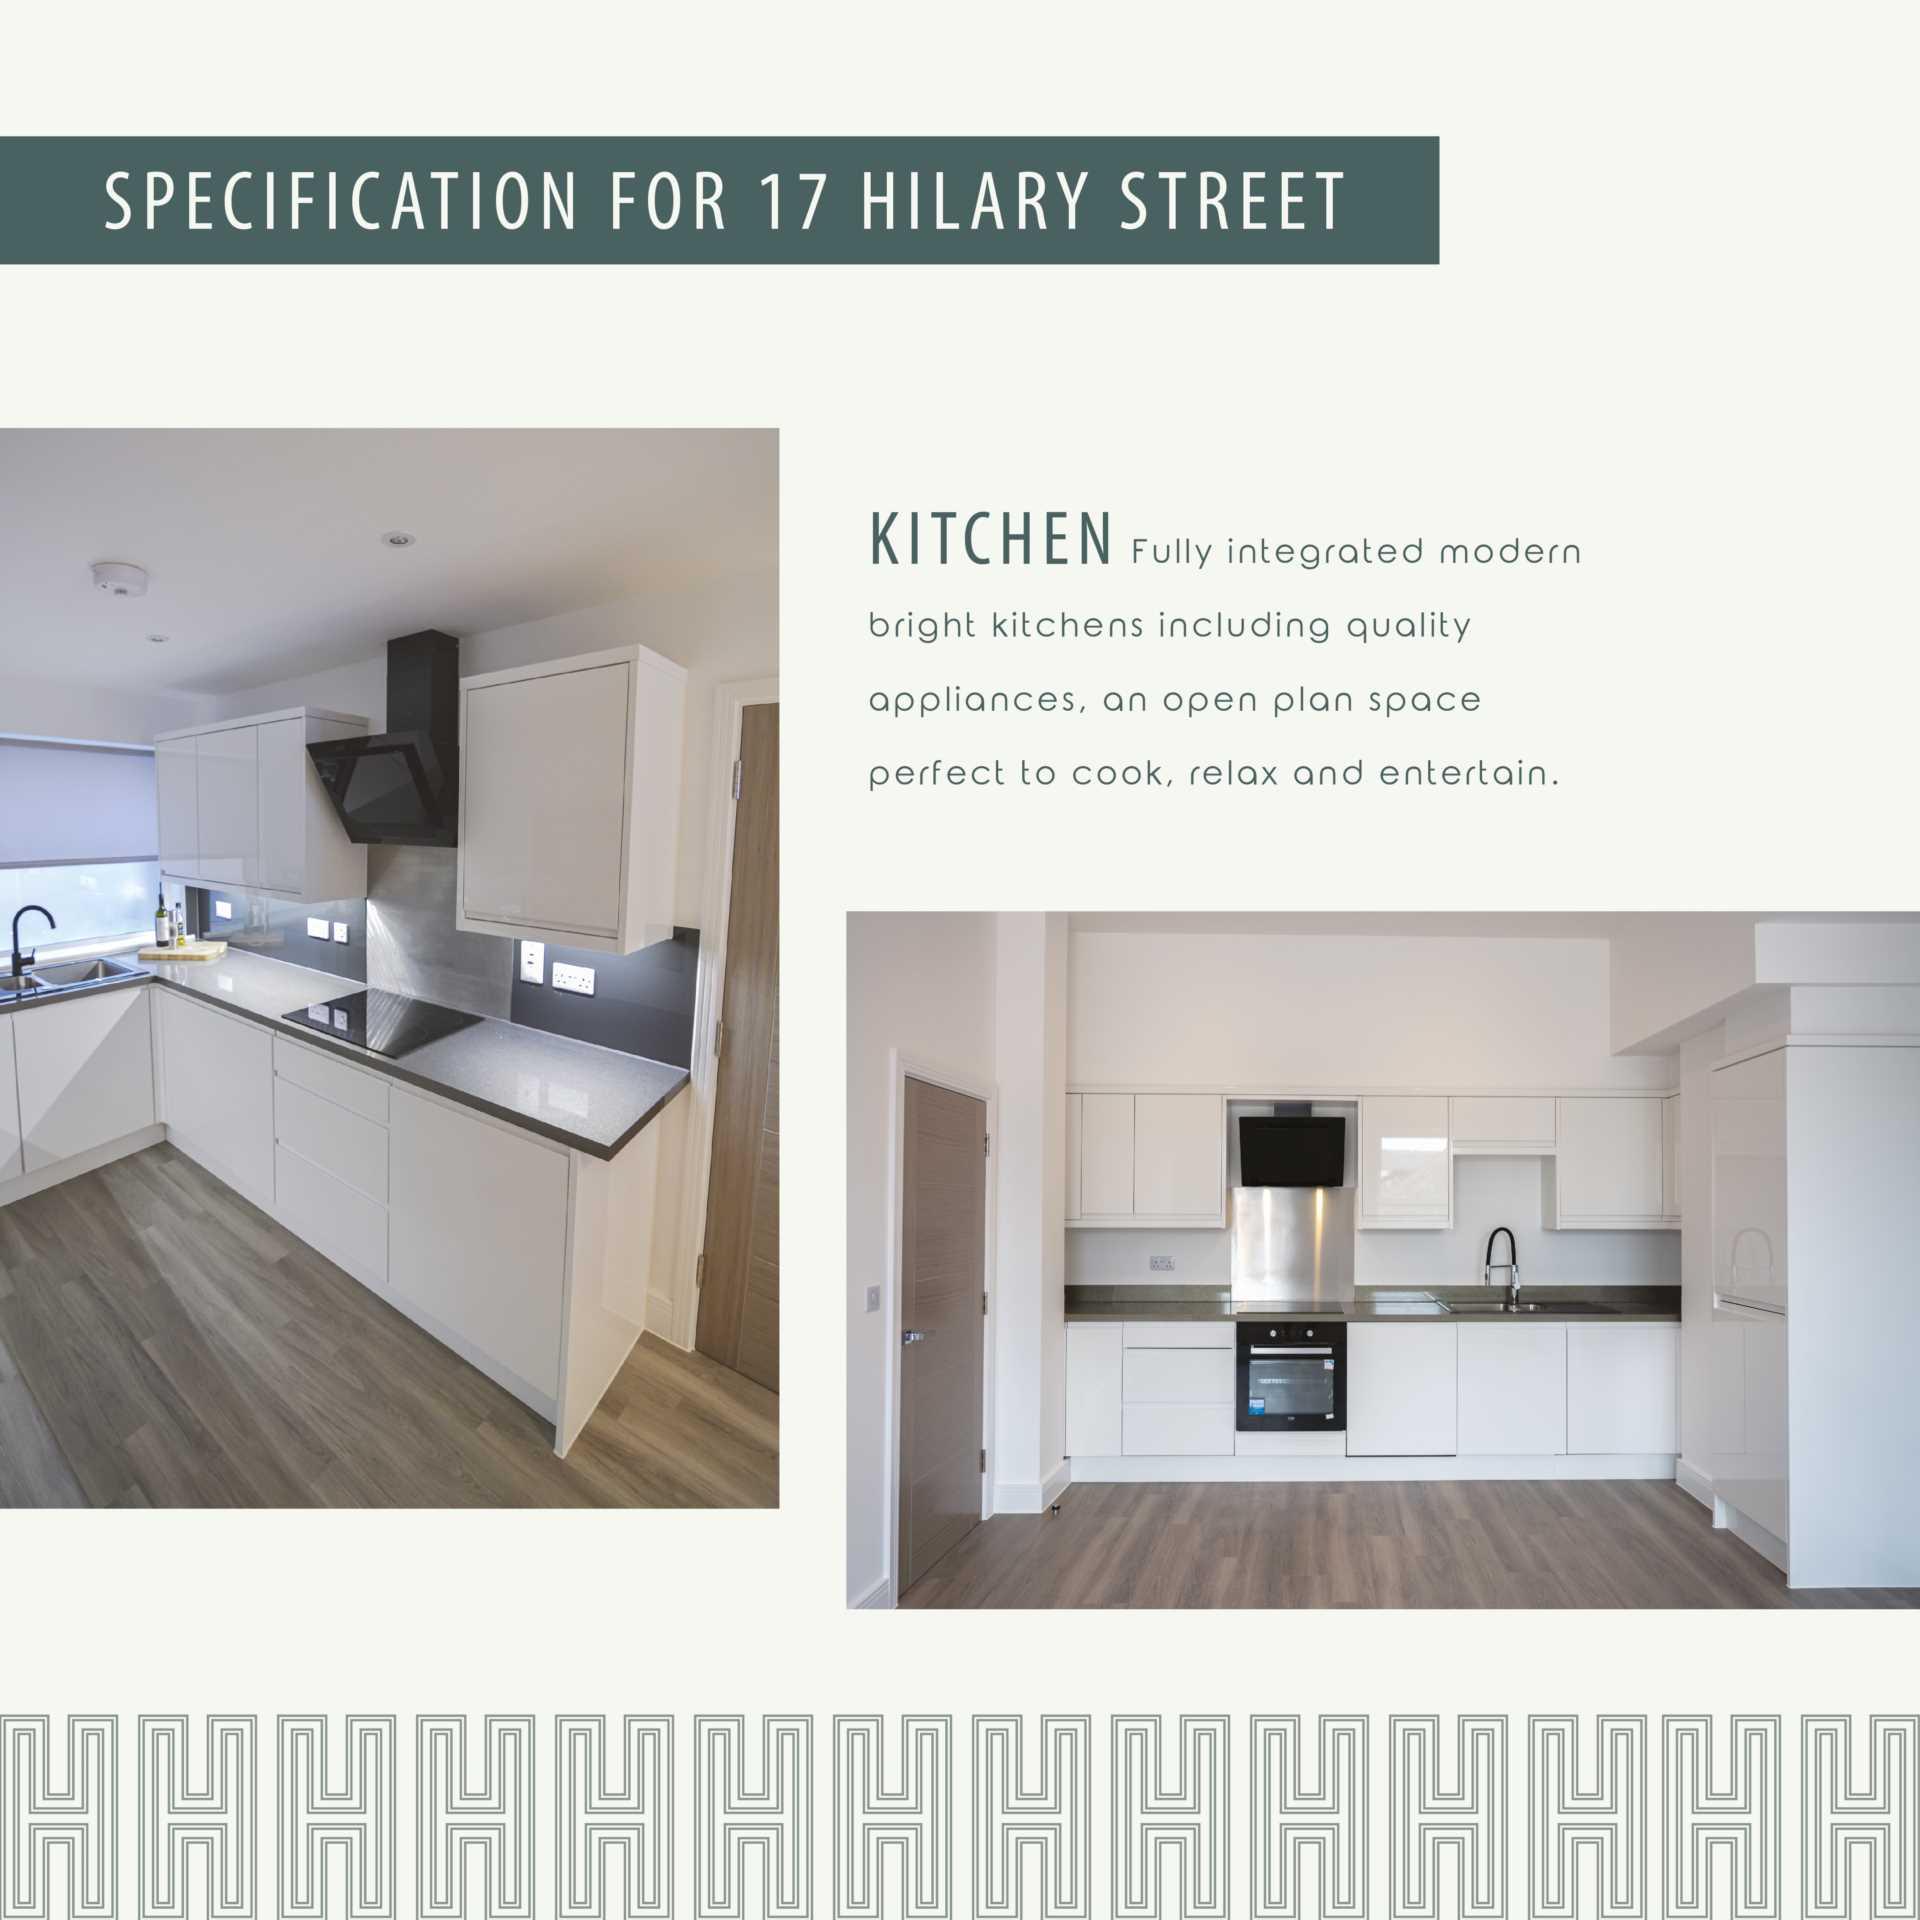 Flat 5, WS, 17 Hilary Street, Image 7